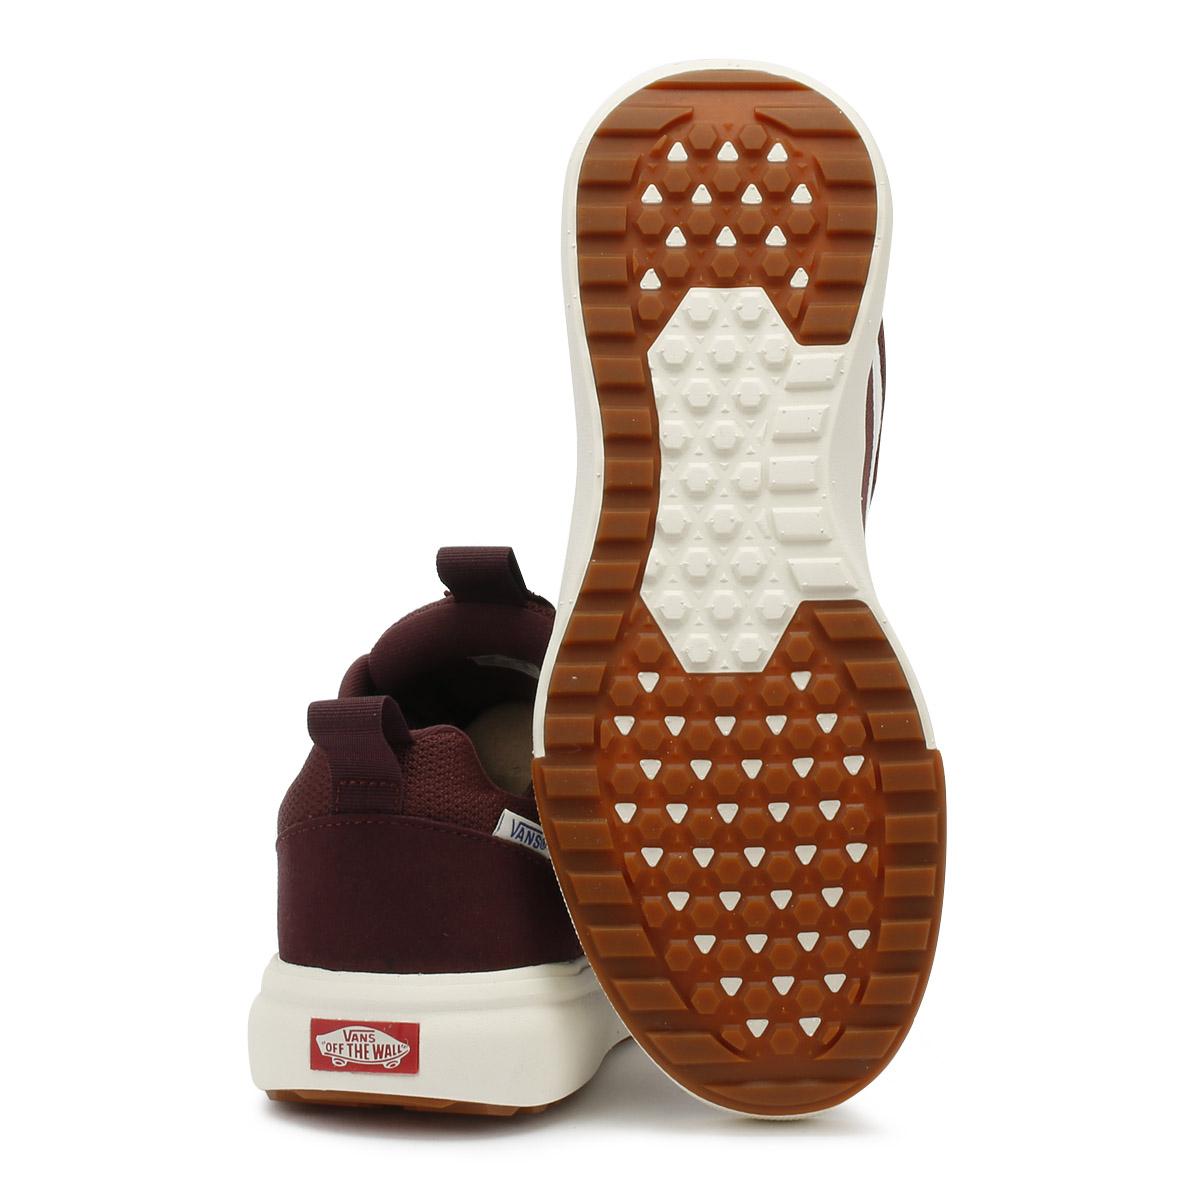 Vans Unisex Trainers Catawba Up Grape Burgundy Ultrarange Lace Up Catawba Skate Schuhes 4cbf85